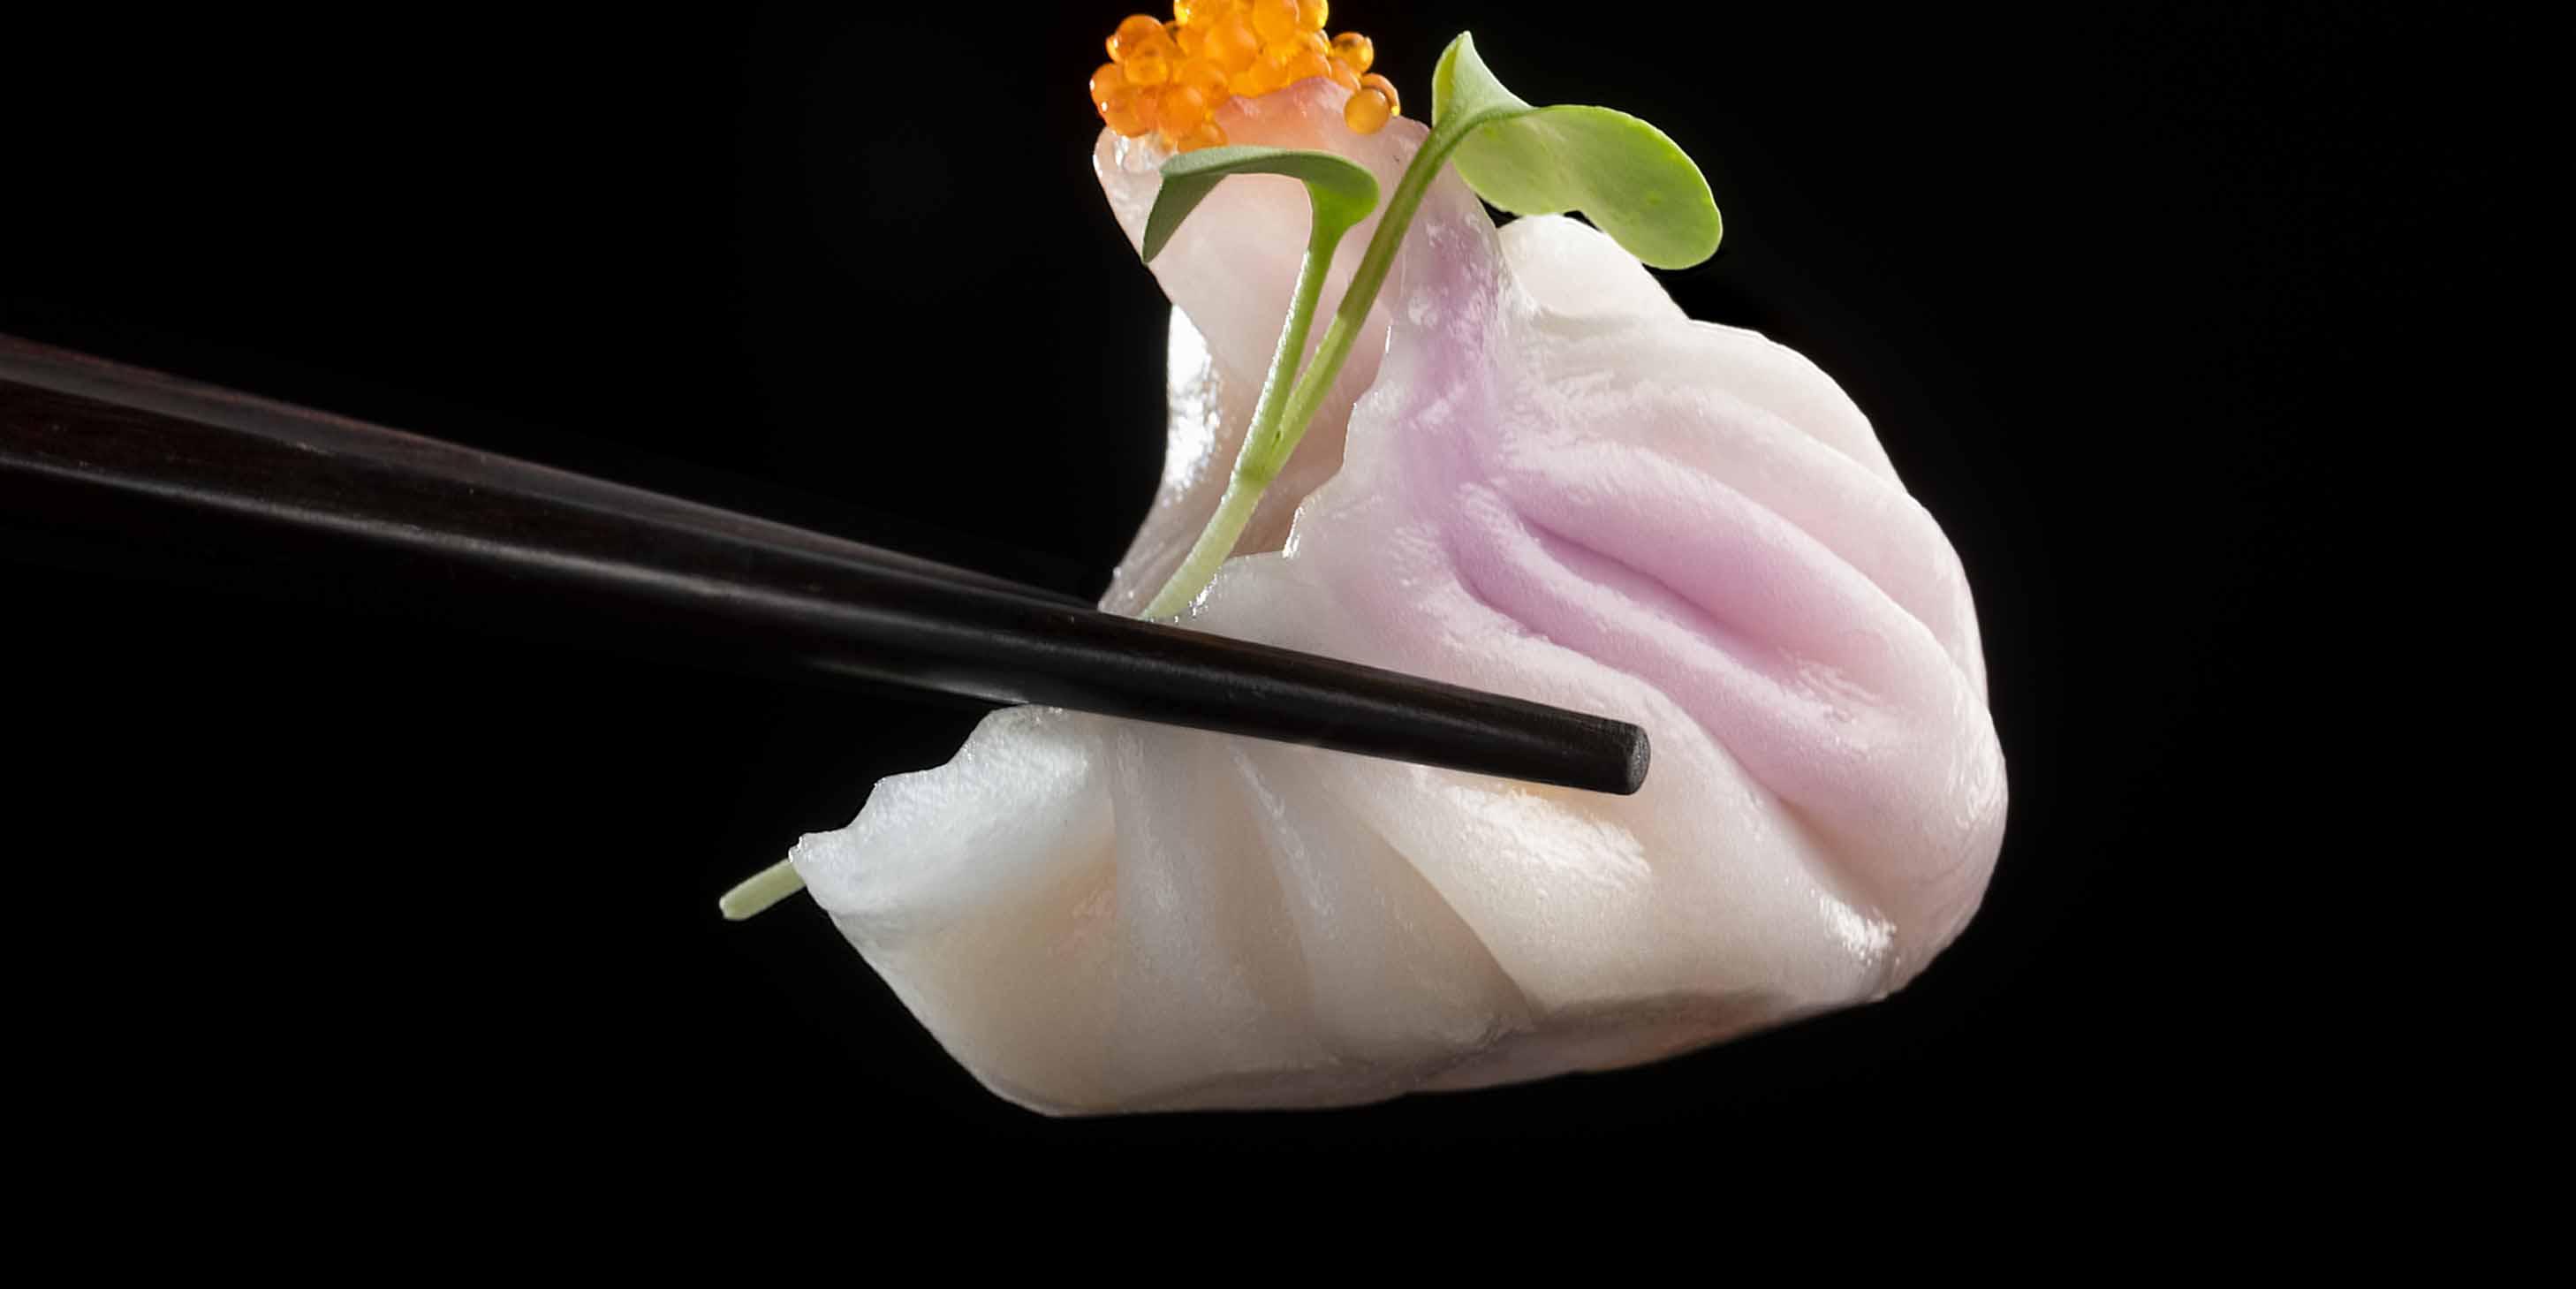 Dumpling of Hakkasan located on the bund